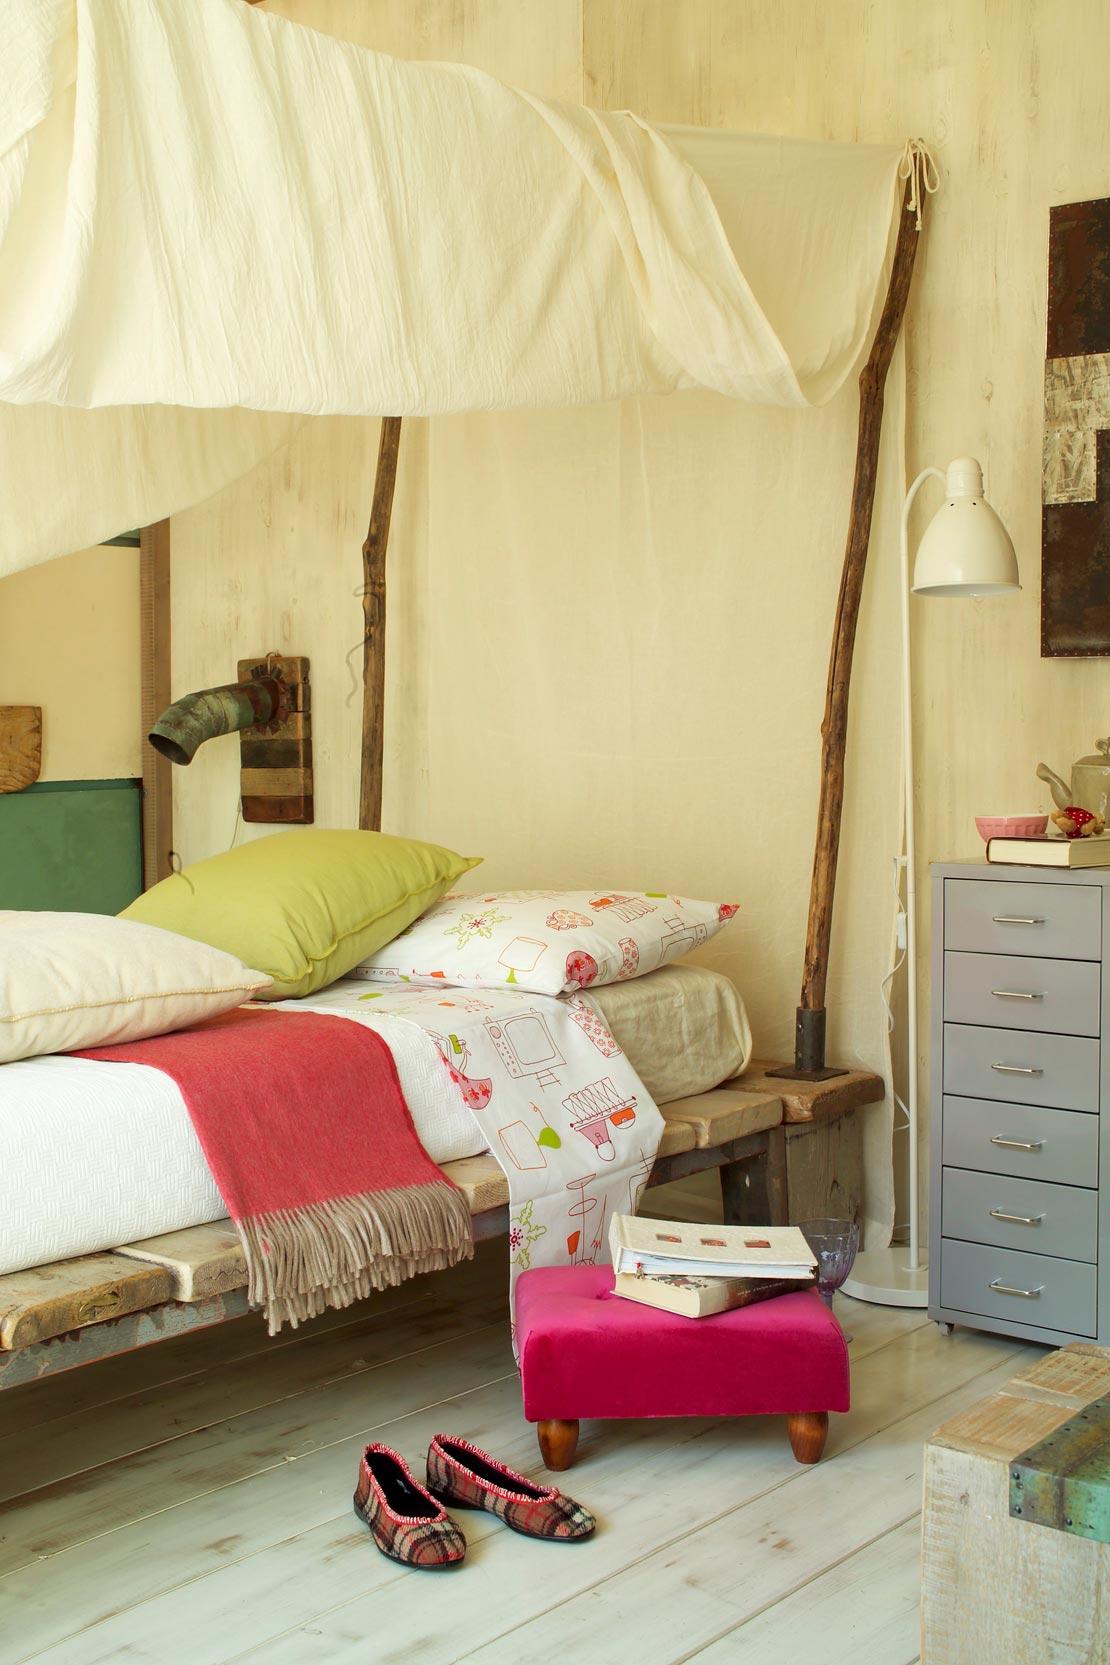 westwing-kinfolk-schlafzimmer-bett